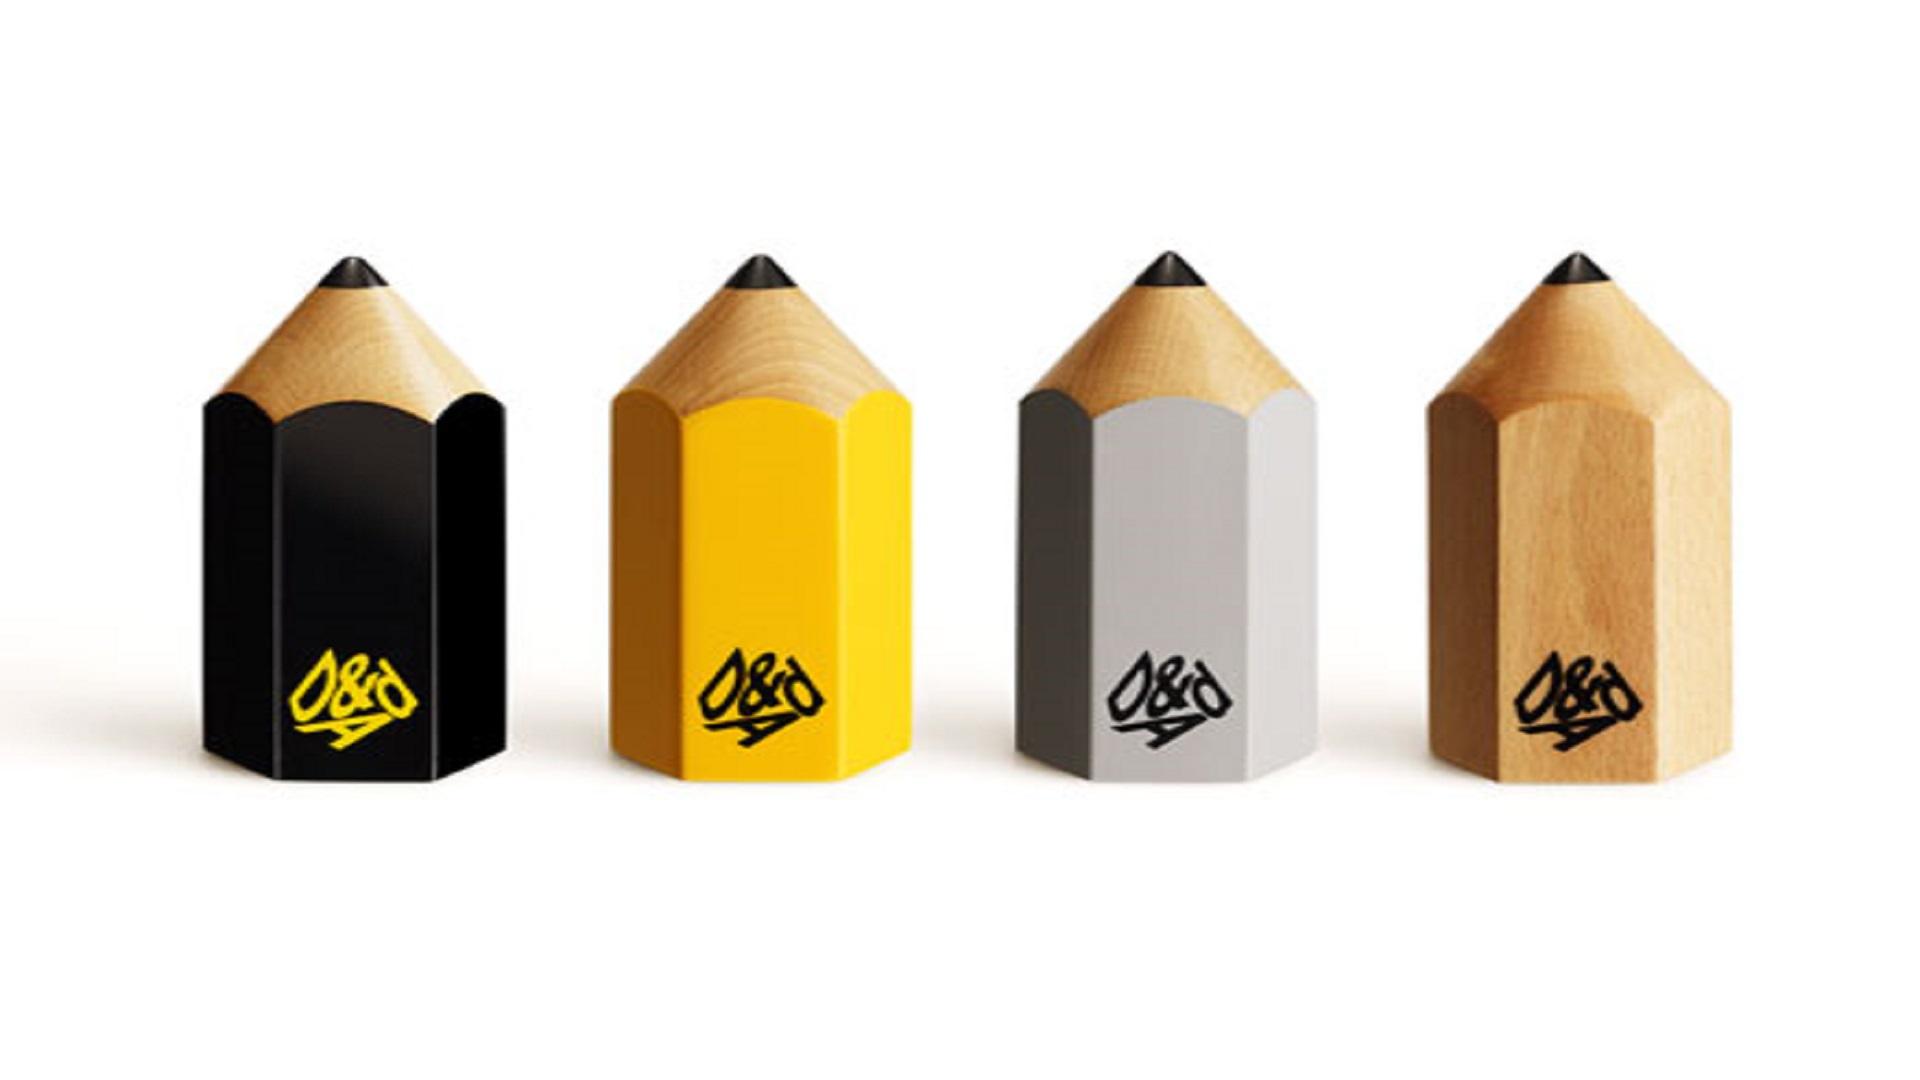 BBC Creative wins Wooden Pencil at D&AD Awards